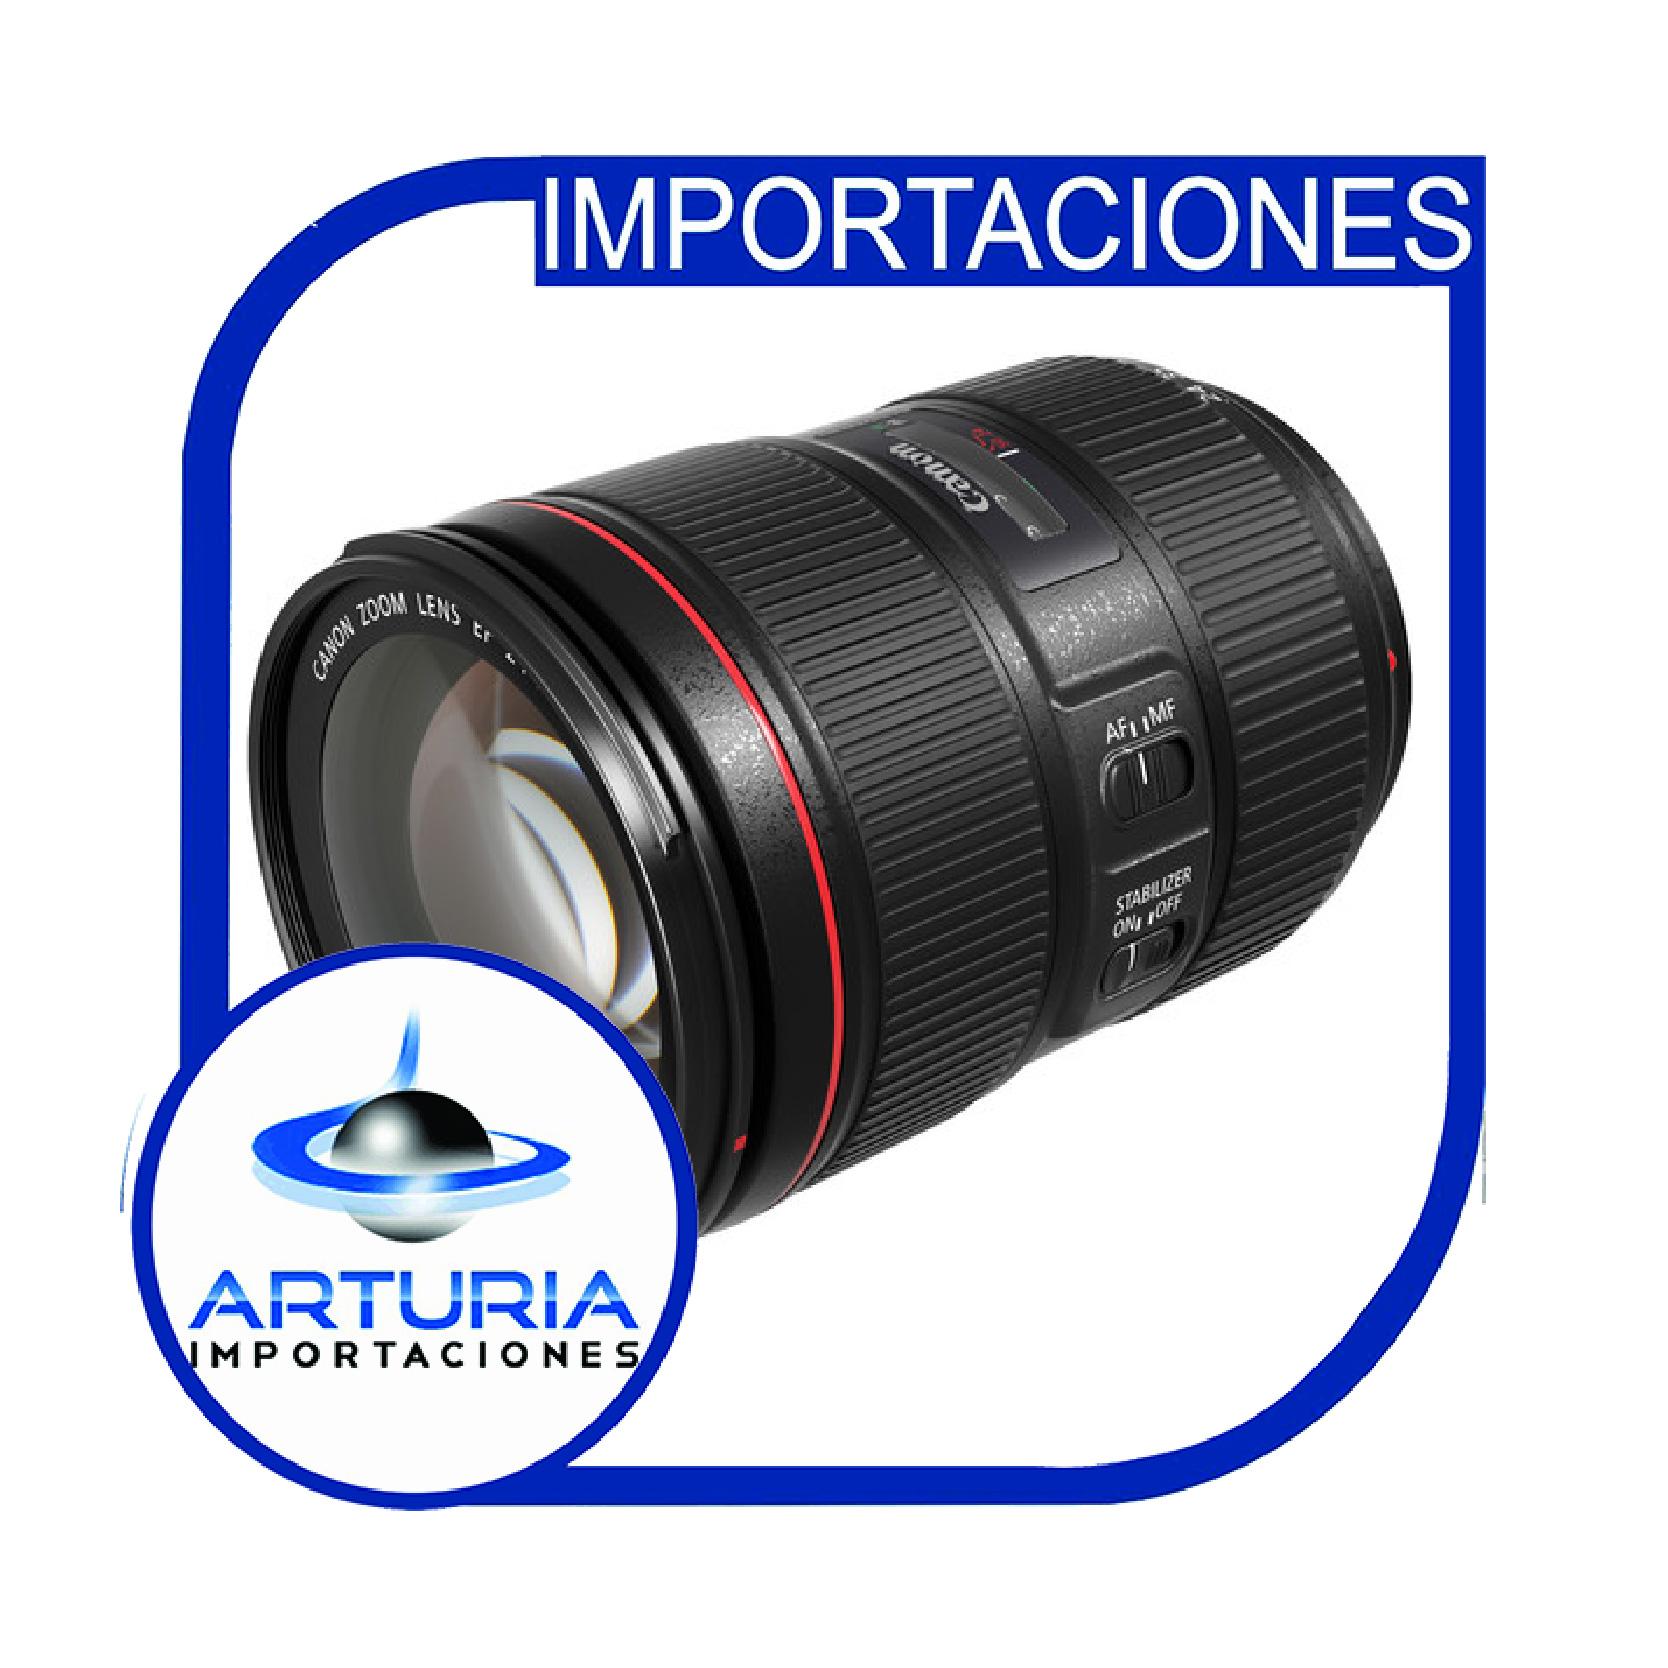 Canon EF 24-105 mm f / 4L IS II USM Lente - Importaciones Arturia